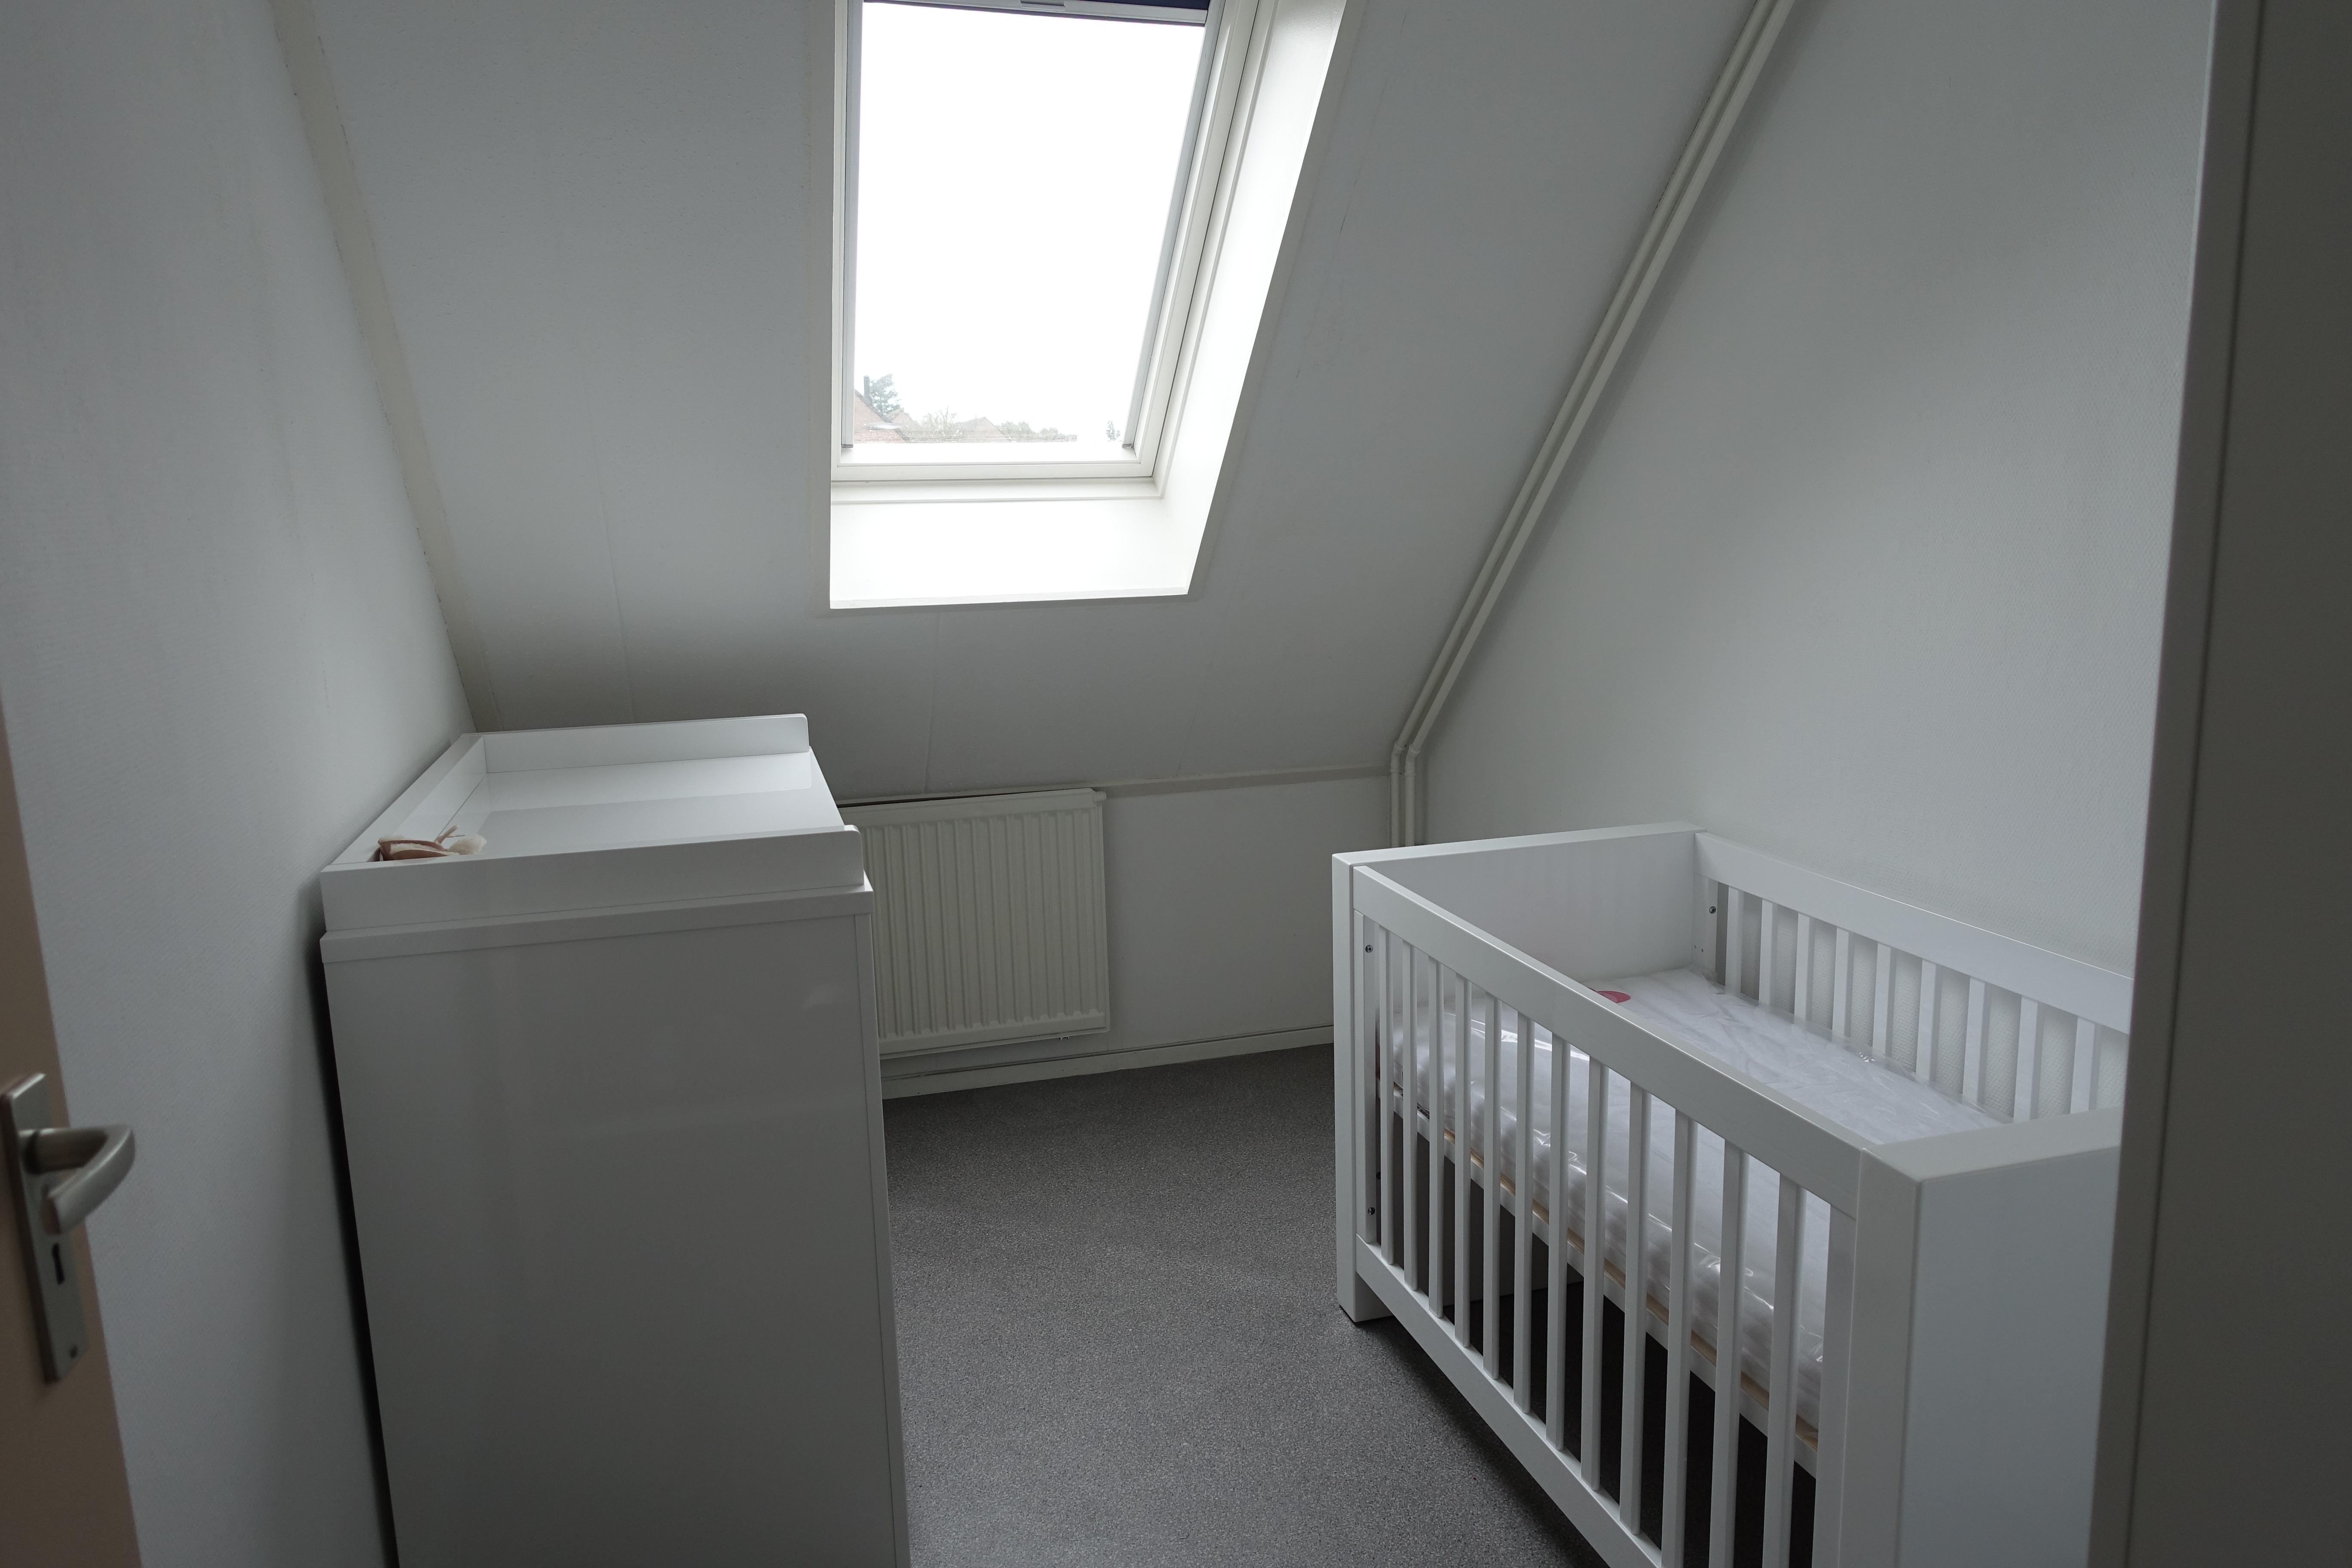 Babykamer In Nisje : Mamashowt project babykamer mamakraamt